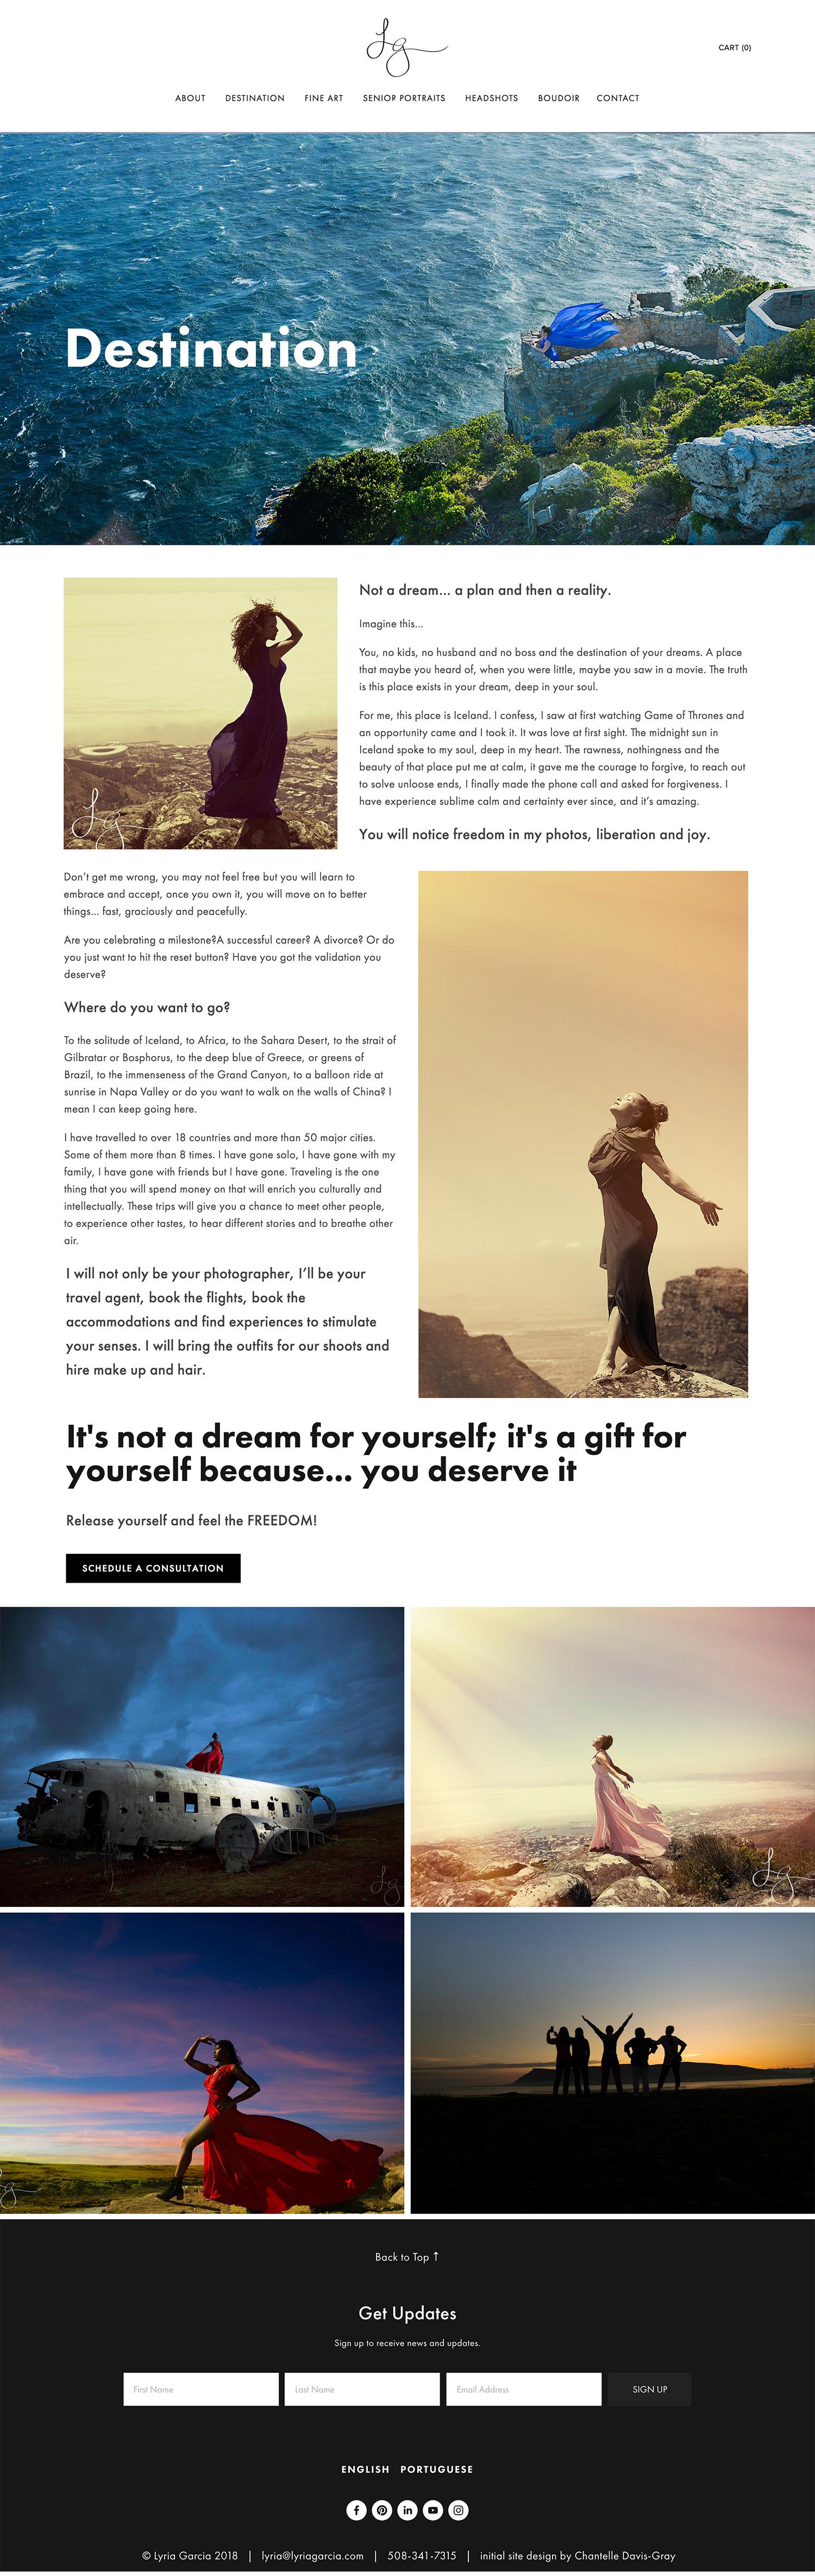 Photographer website designed on Squarespace